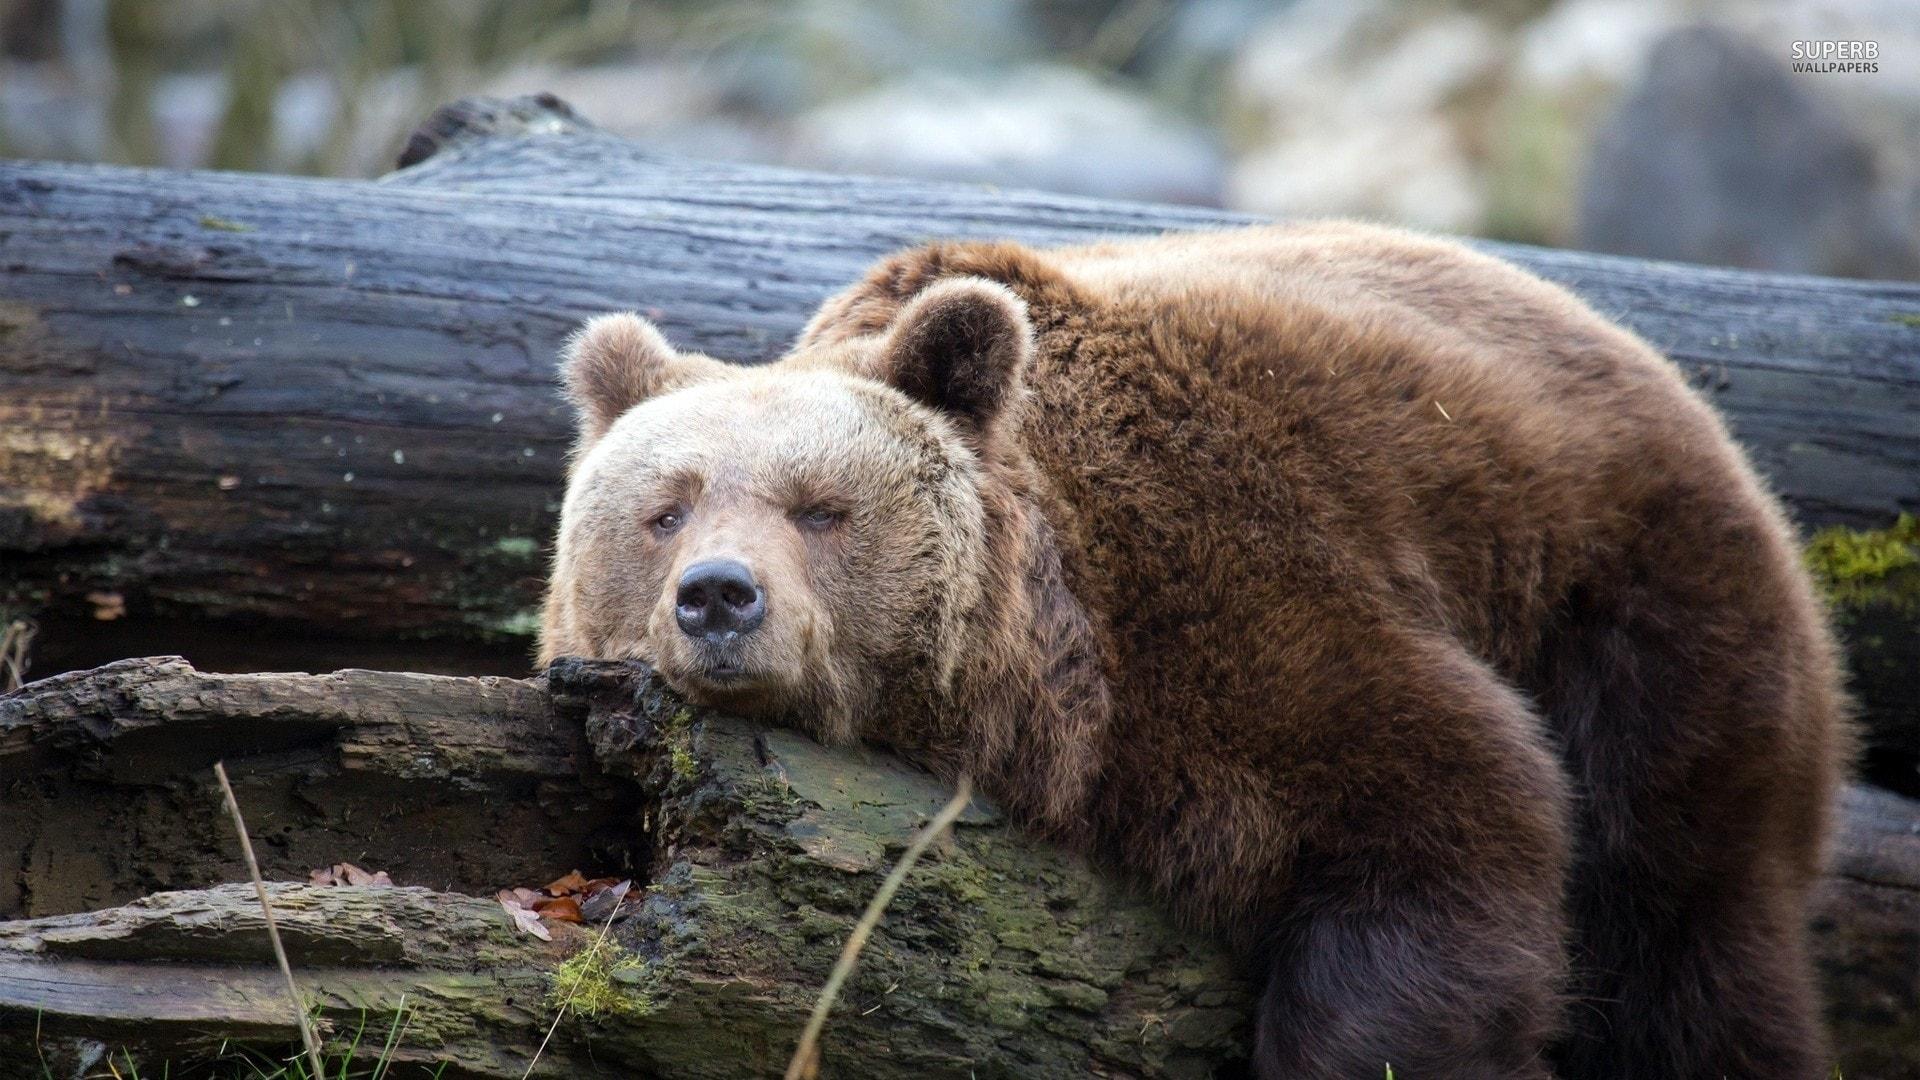 Bear wallpapers hd